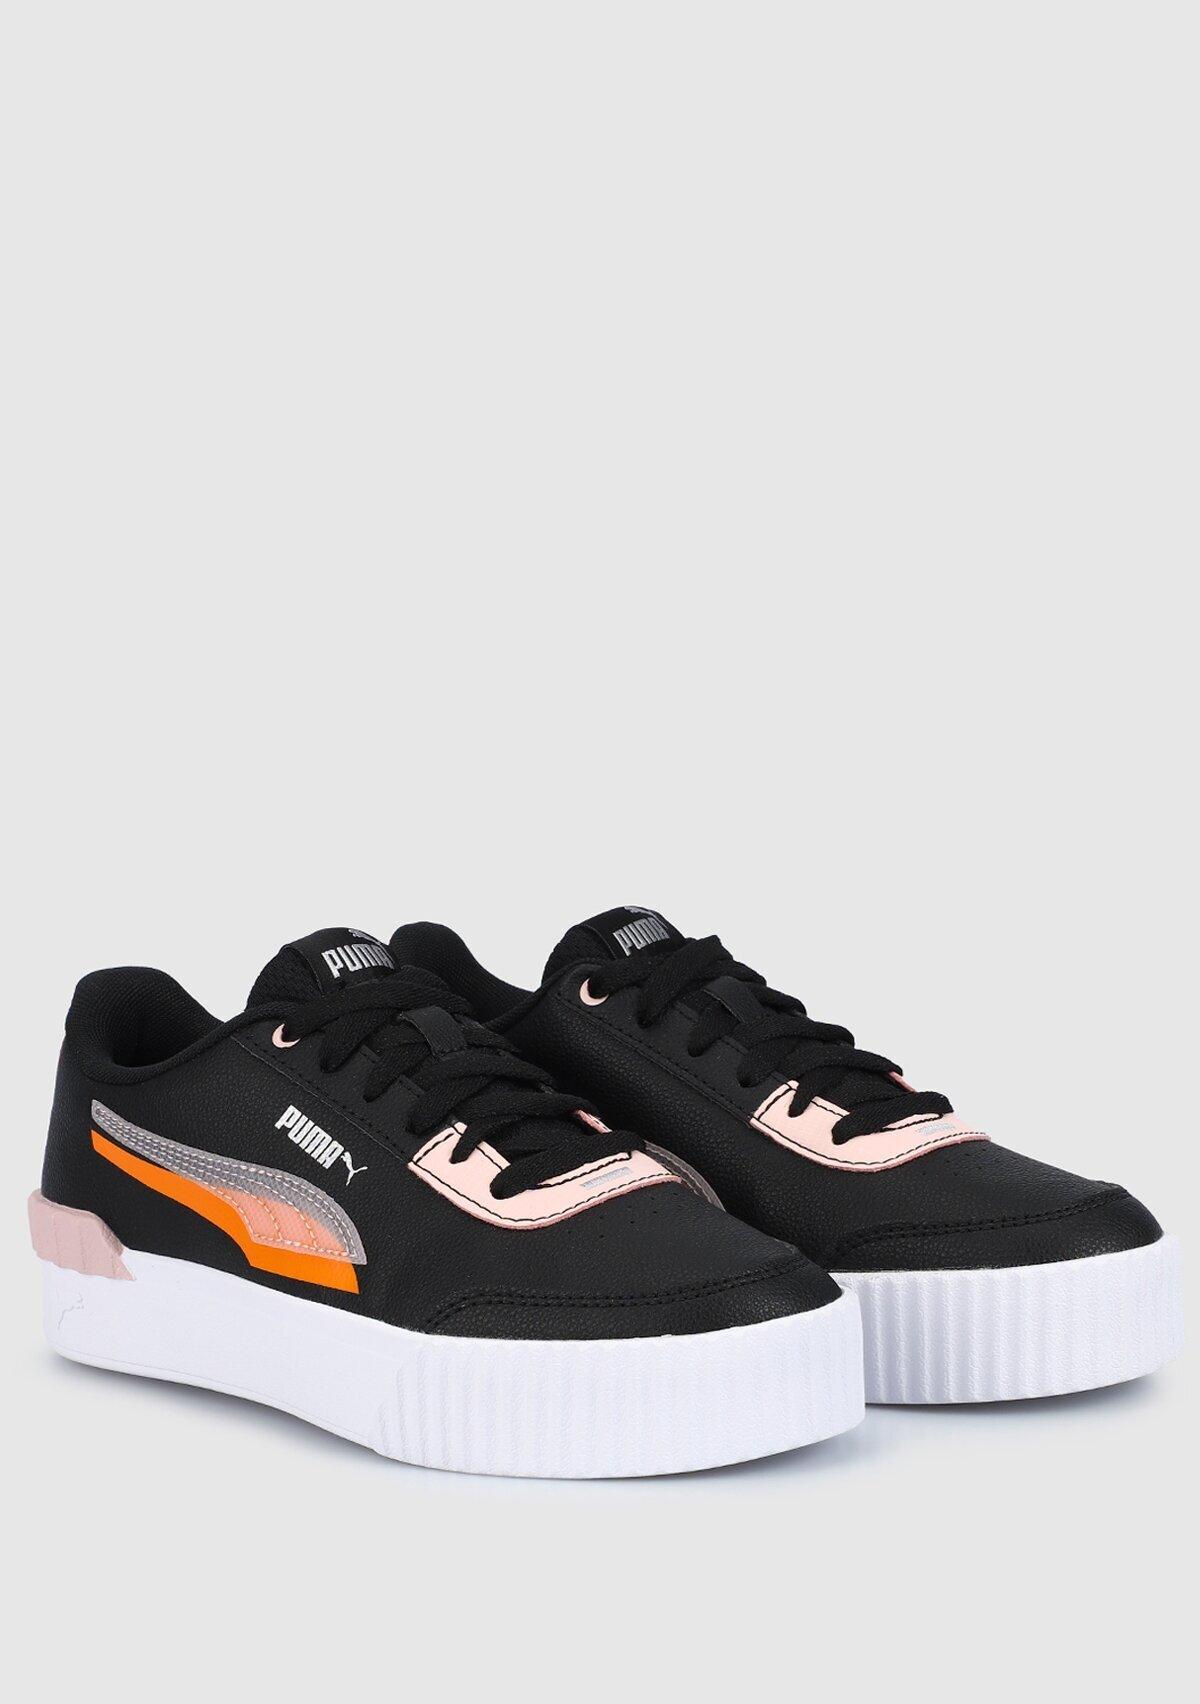 resm Carina Lift Shadow Puma Black-Lotus Siyah Kadın Sneaker 38191501